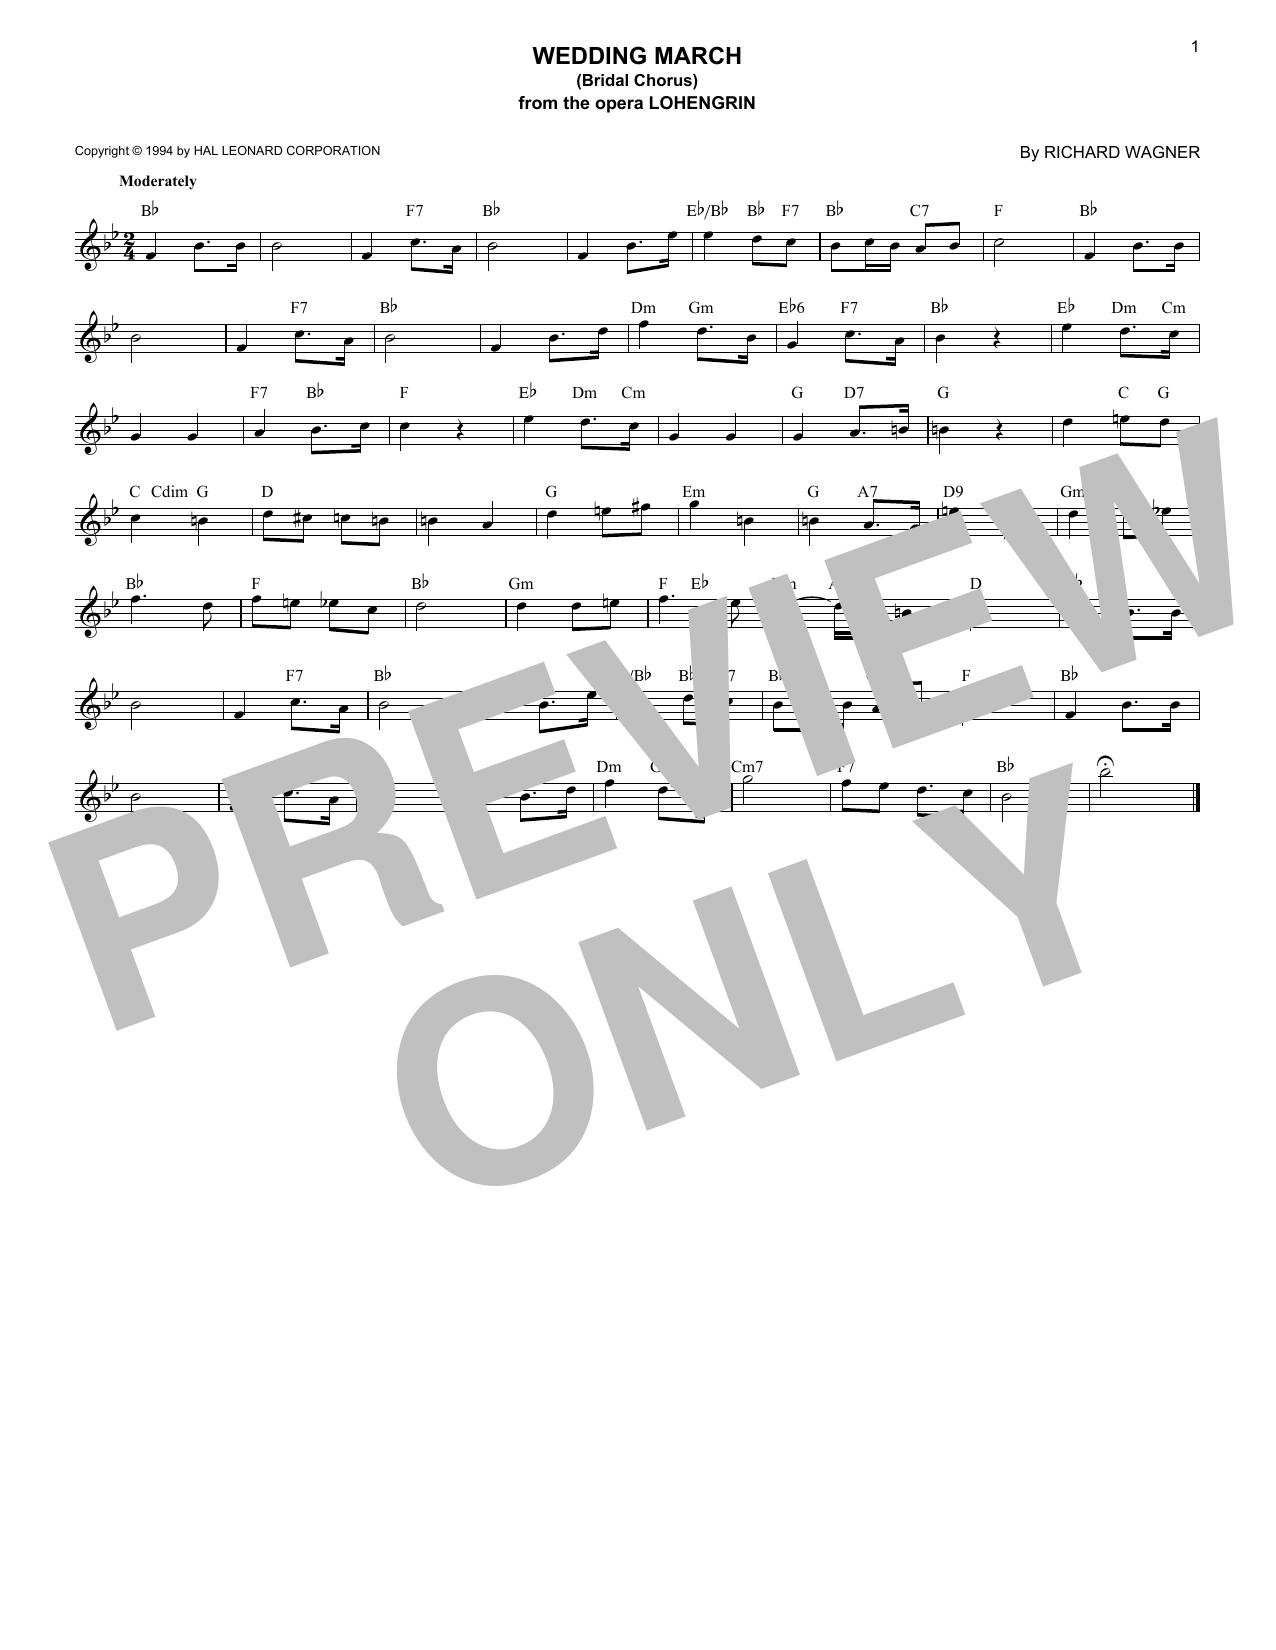 Richard Wagner Wedding March (Bridal Chorus) sheet music notes and chords - download printable PDF.